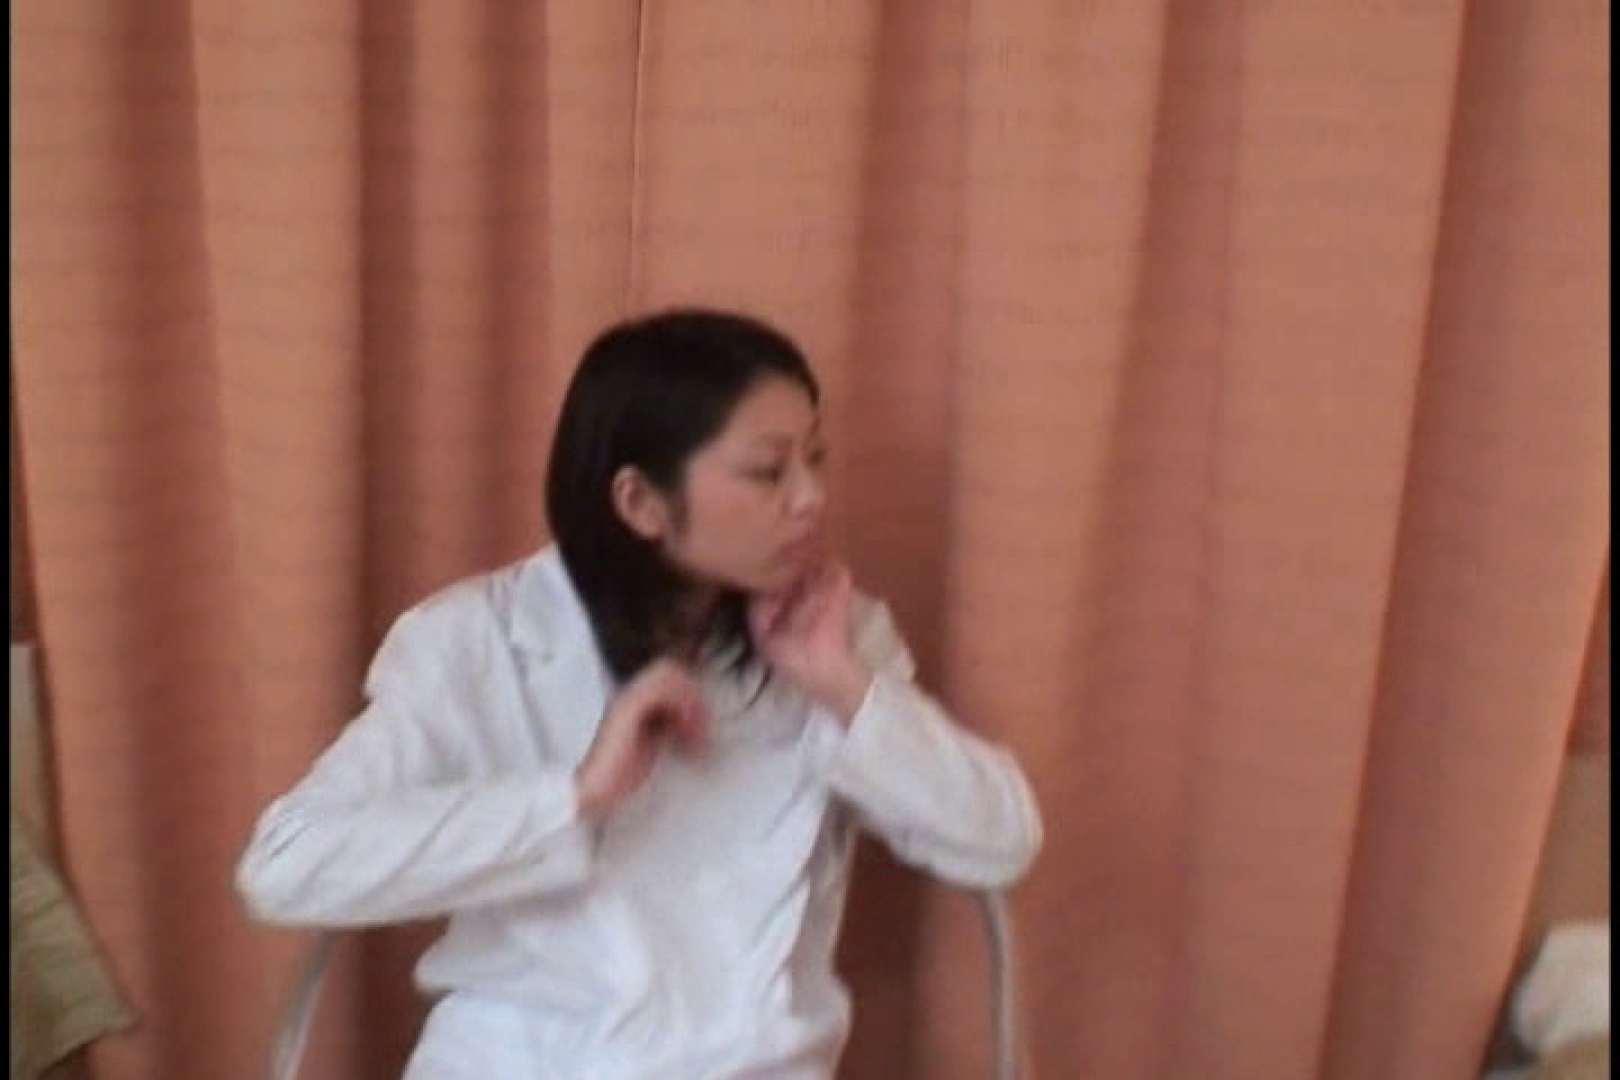 JDハンター全国ツアー vol.011 後編 女子大生のエロ動画 | 0  99PIX 35